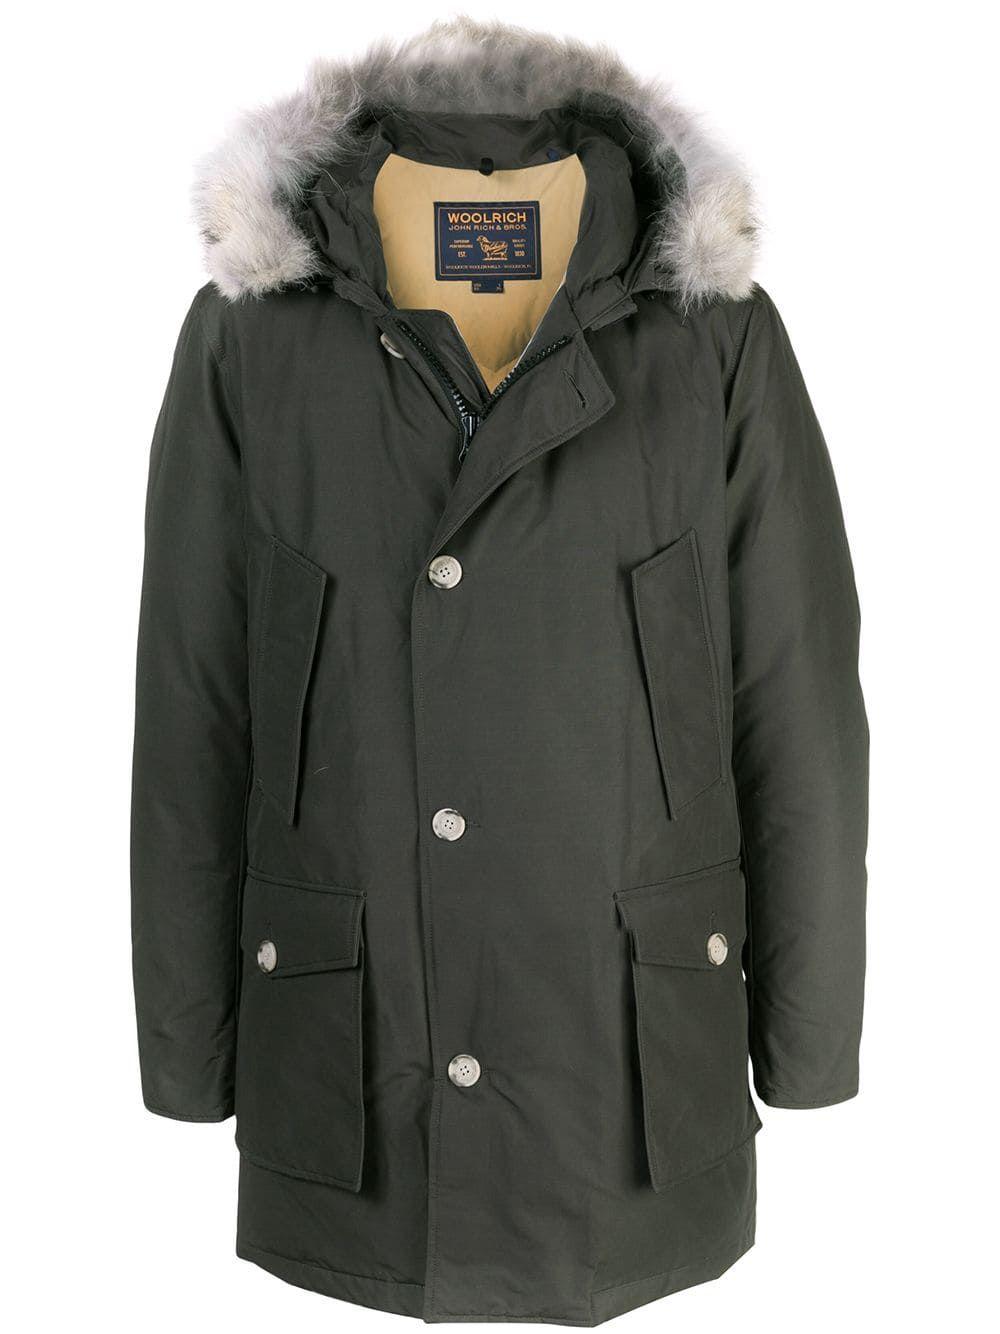 Woolrich Arctic Parka Coat In Green Modesens Arctic Parka Parka Coat Casual Coat